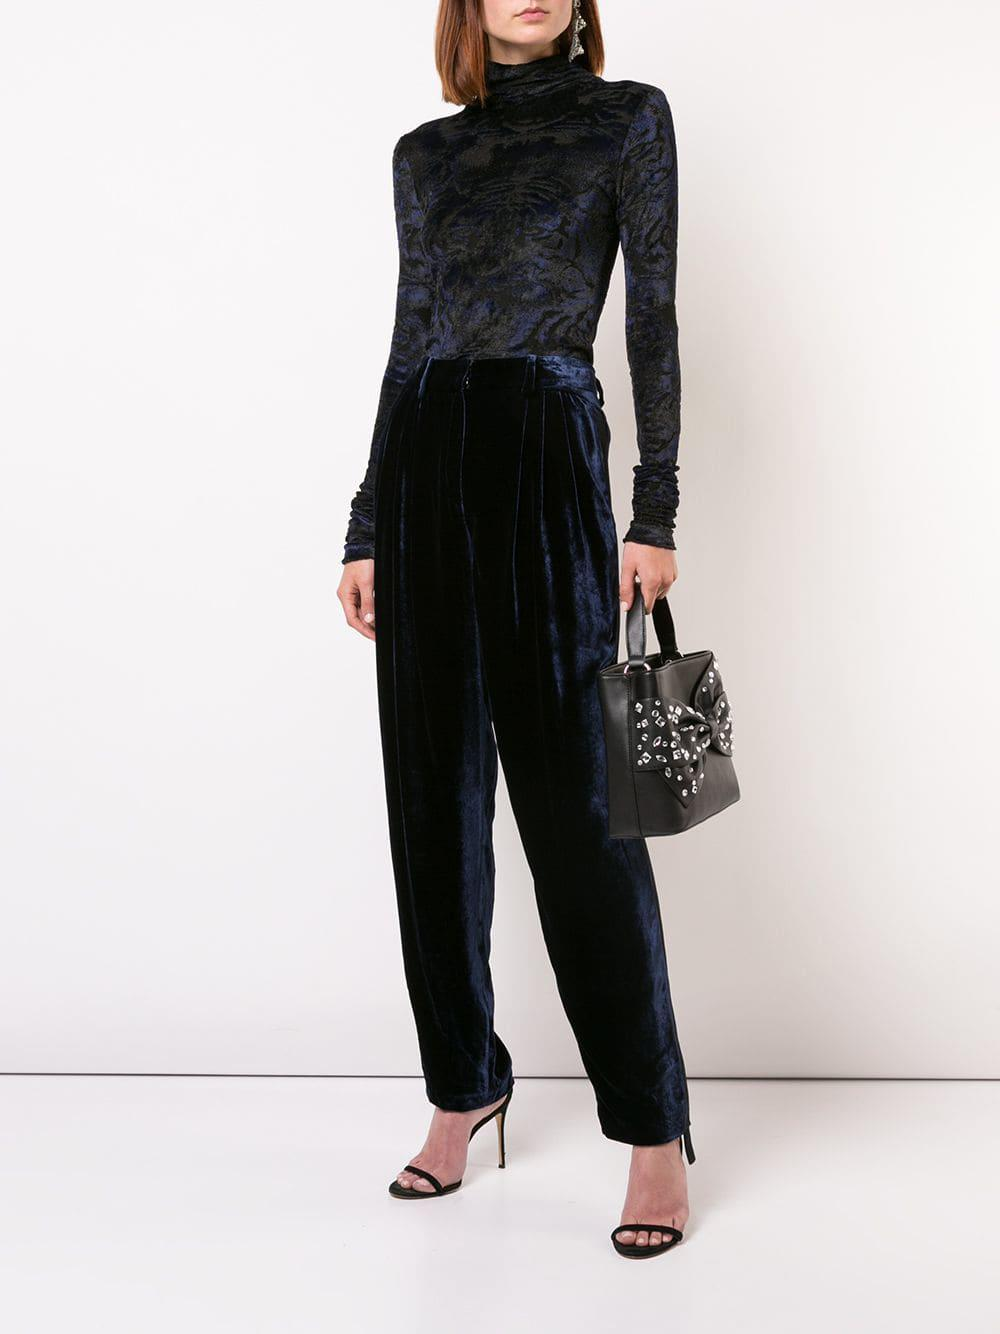 Black Tote Bag Bow Siriano Embellished In Lyst Christian vm7yYfb6gI